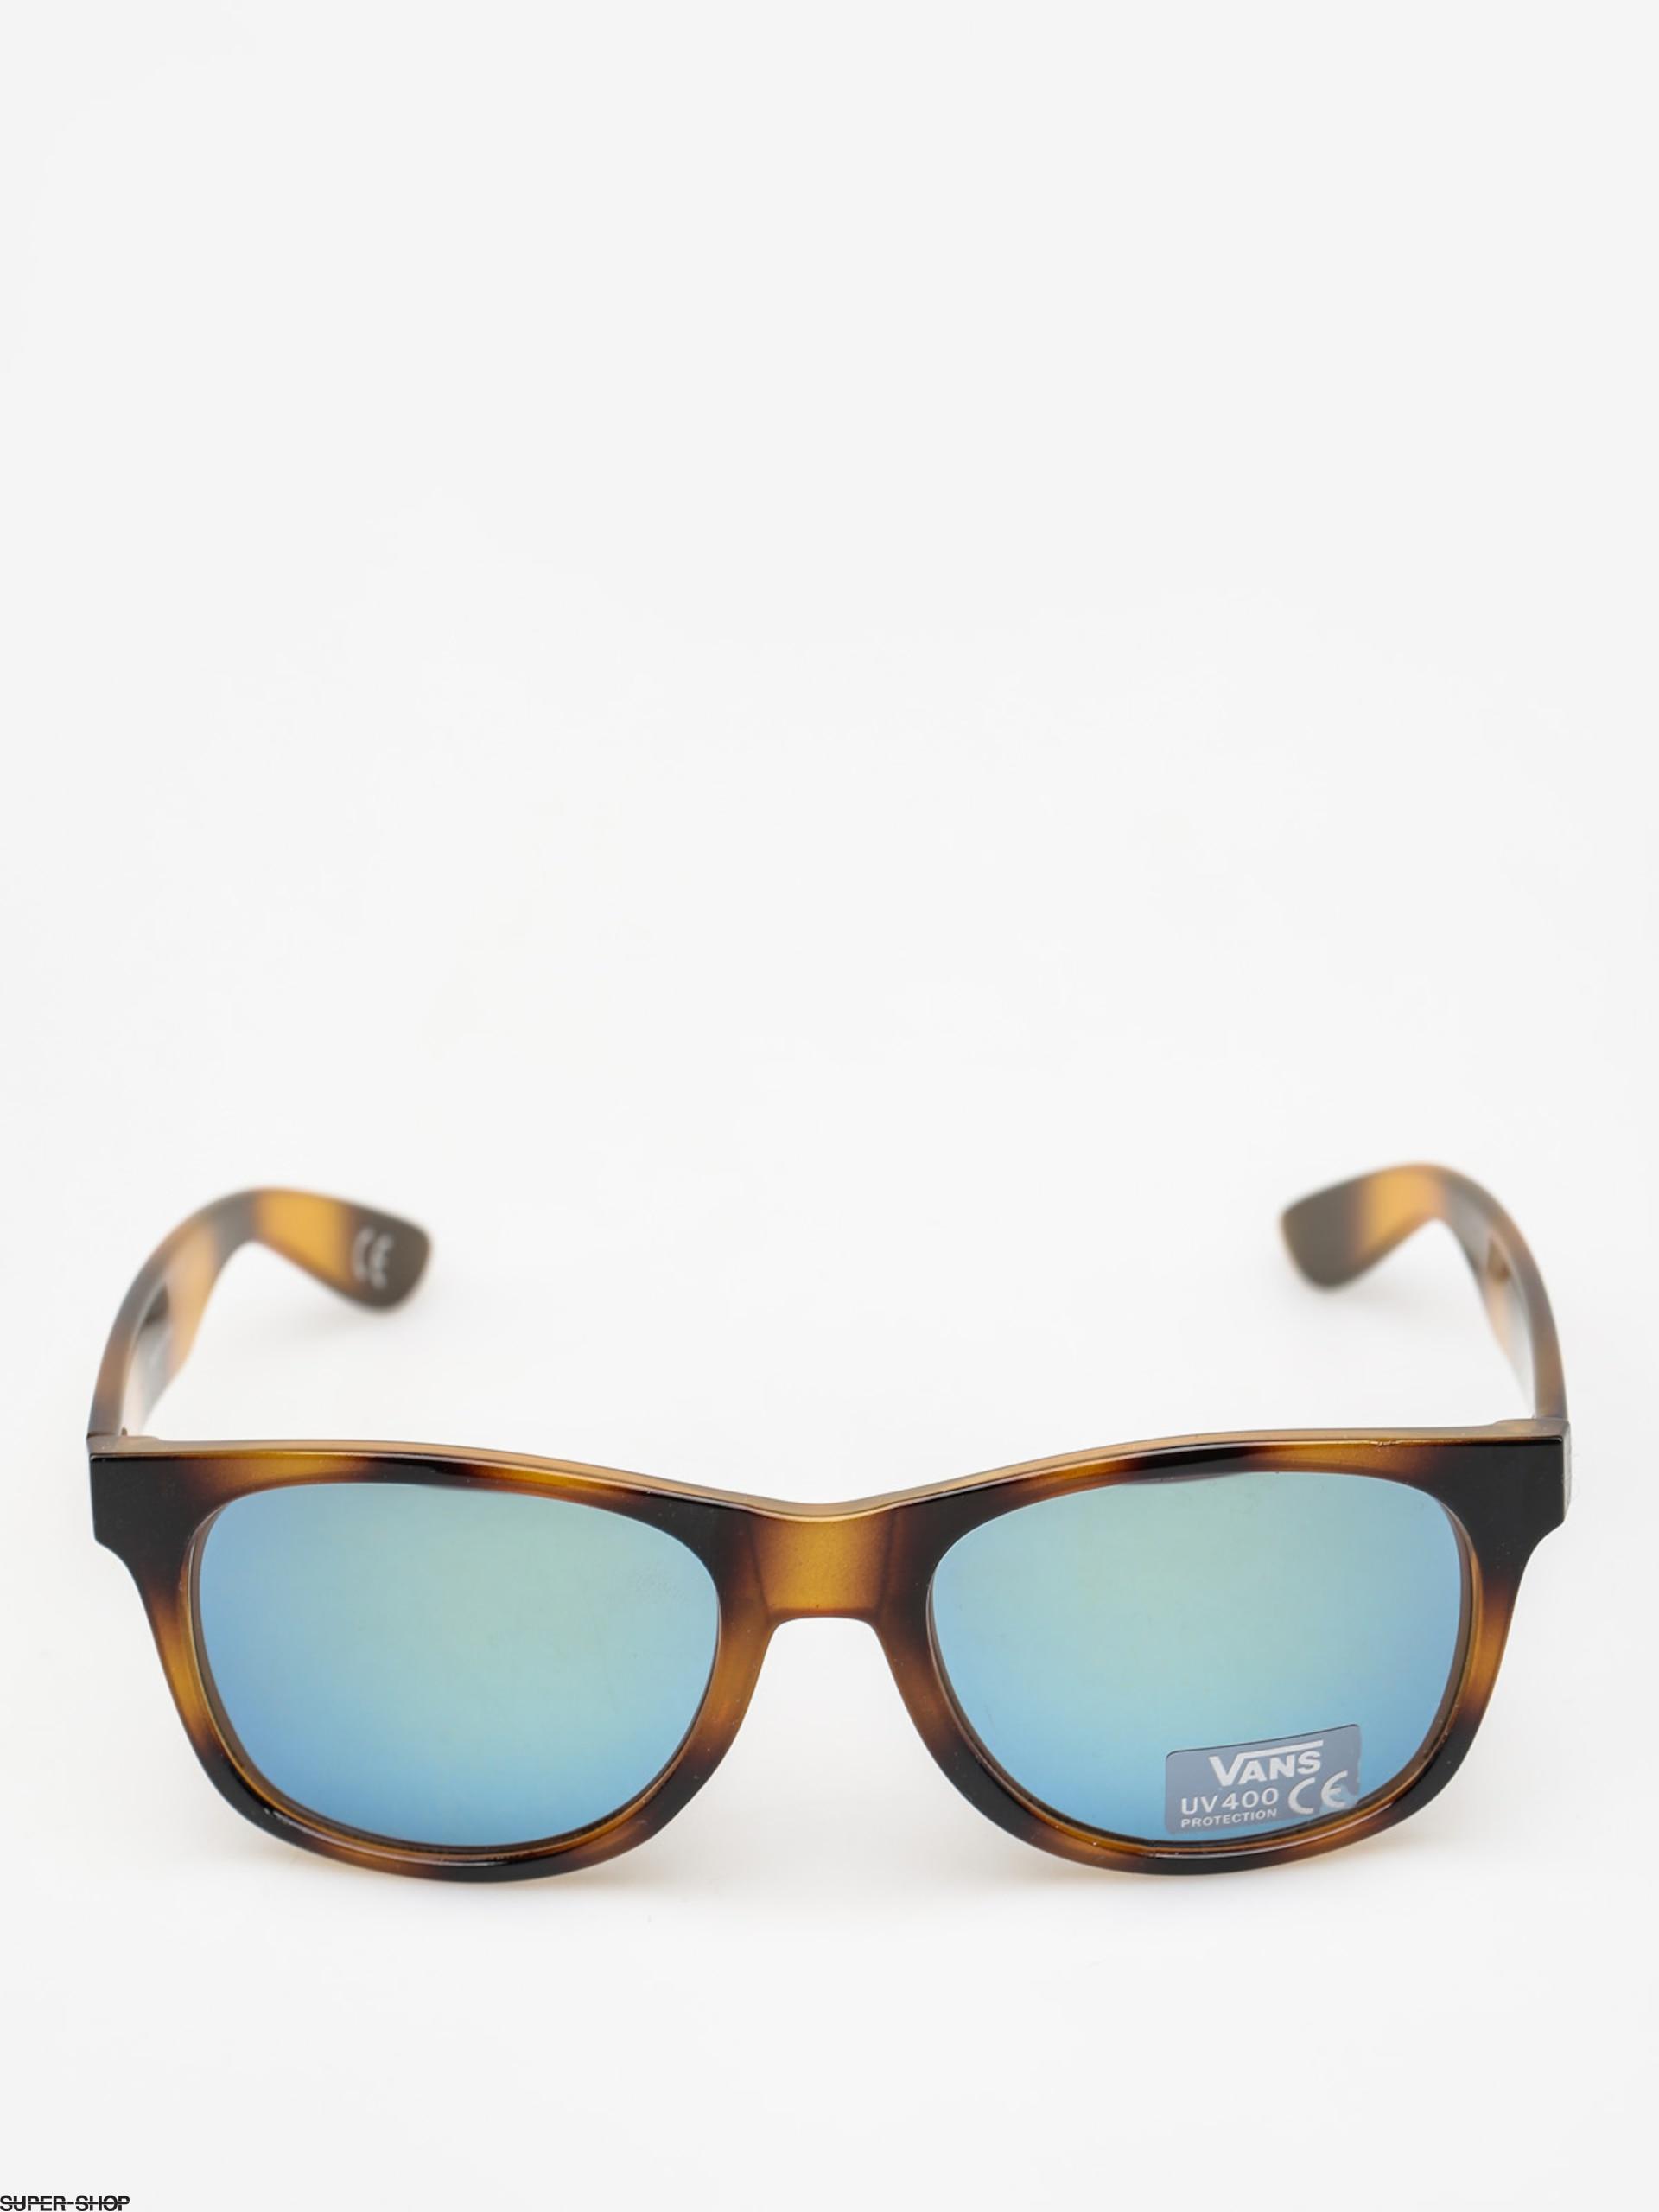 cd302ef89f Vans Sunglasses Spicoli 4 Shades (brown tortoise)